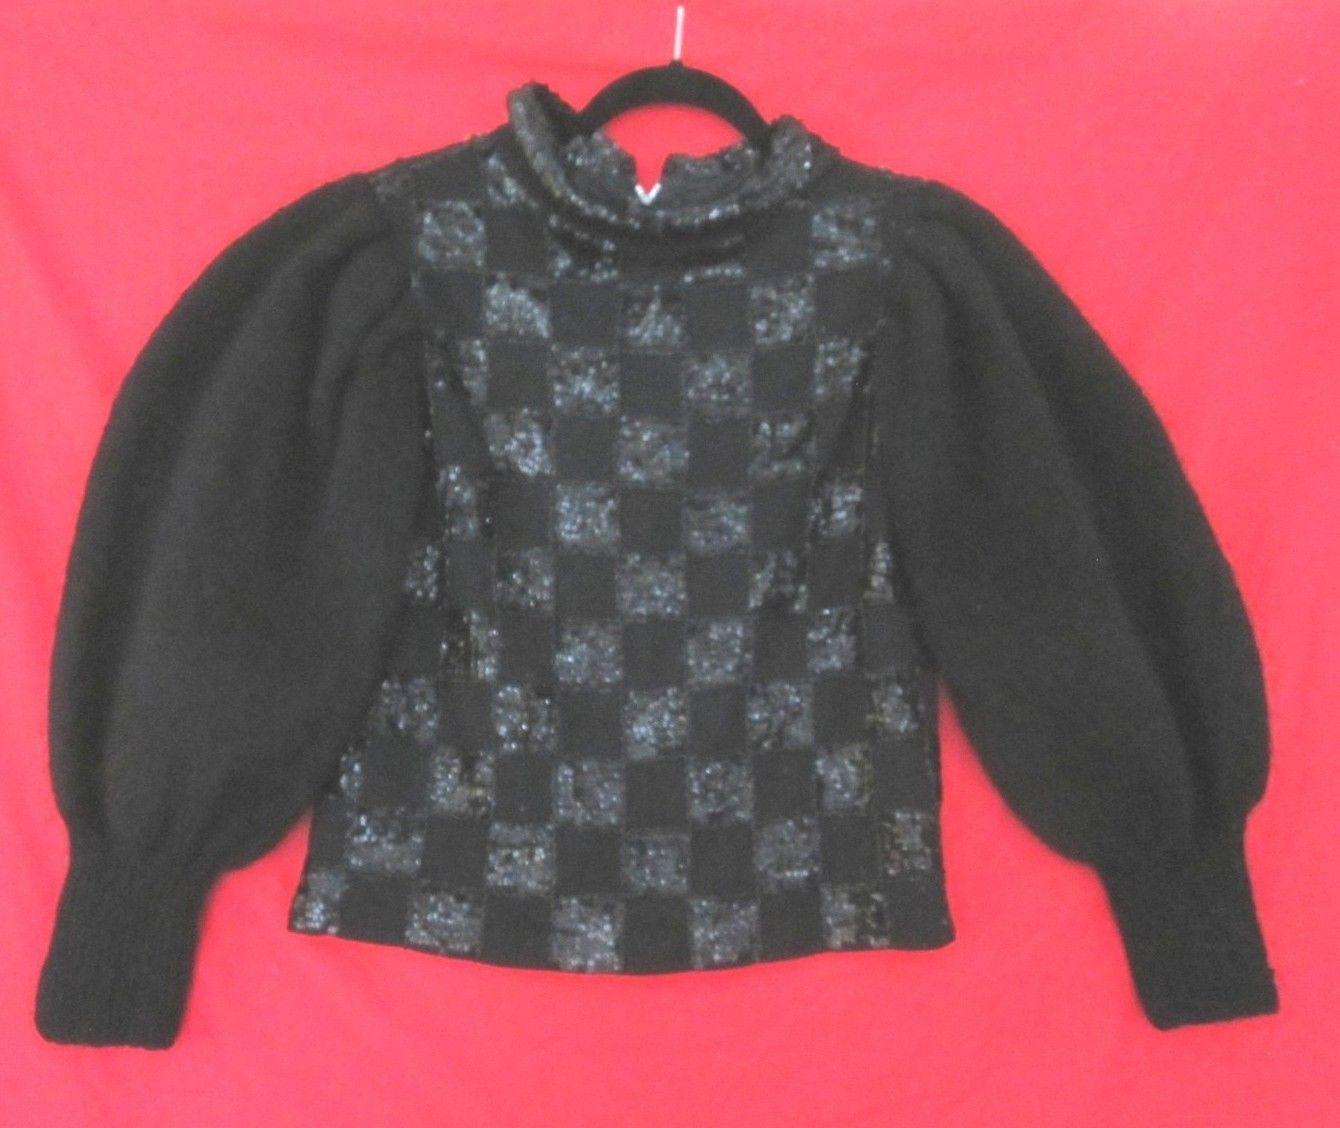 Vintage 80's Avant Garde Puff Sleeve Sweater Hand Decorated Sequin S | eBay